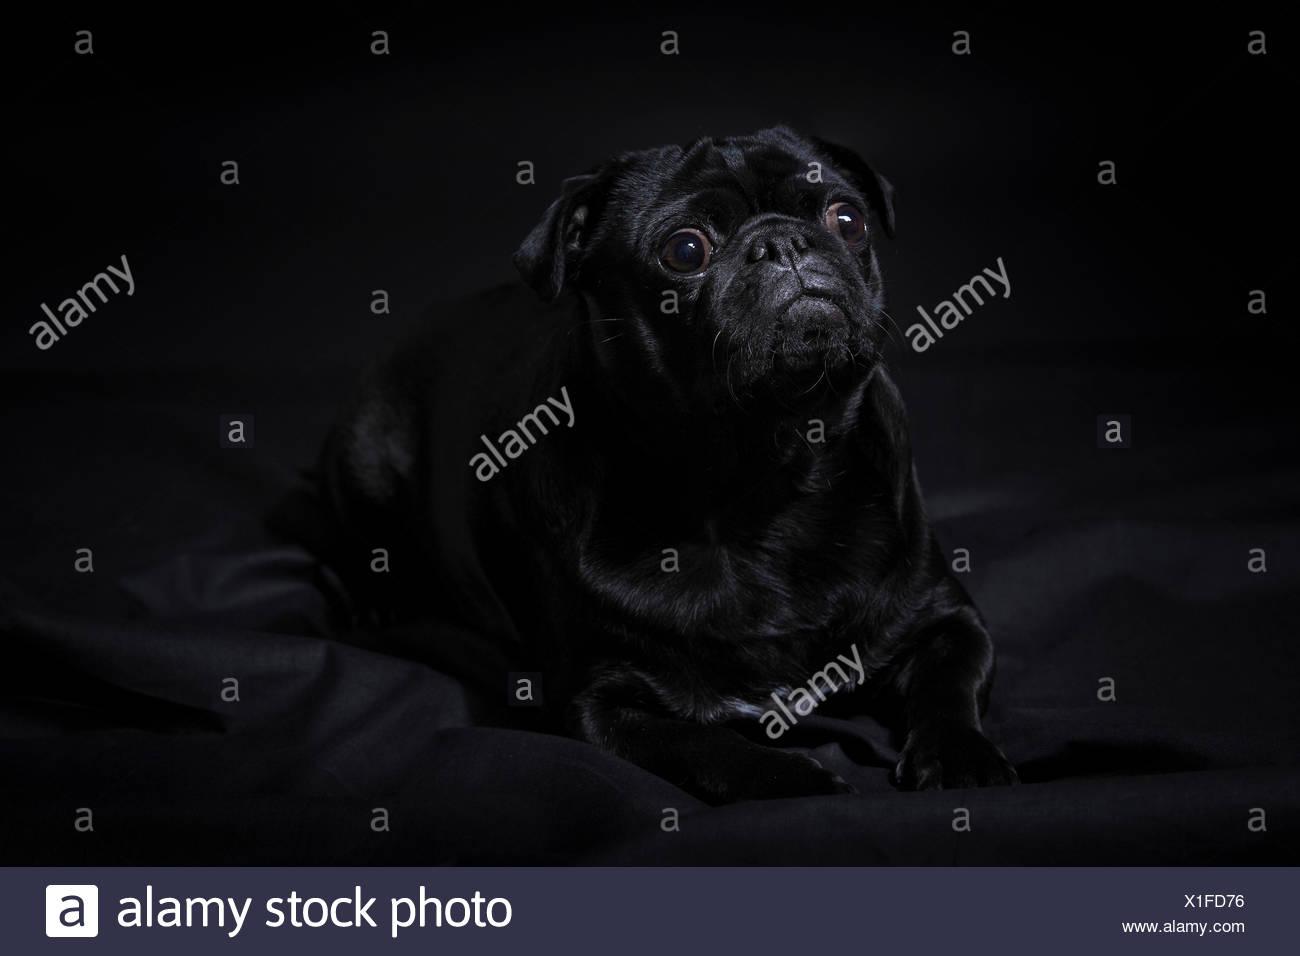 Domestic animal, Pet, dog, pug, fatty, portrait, four-legged, animal, dark, one, elegant, lie, black background, sweet, black, - Stock Image